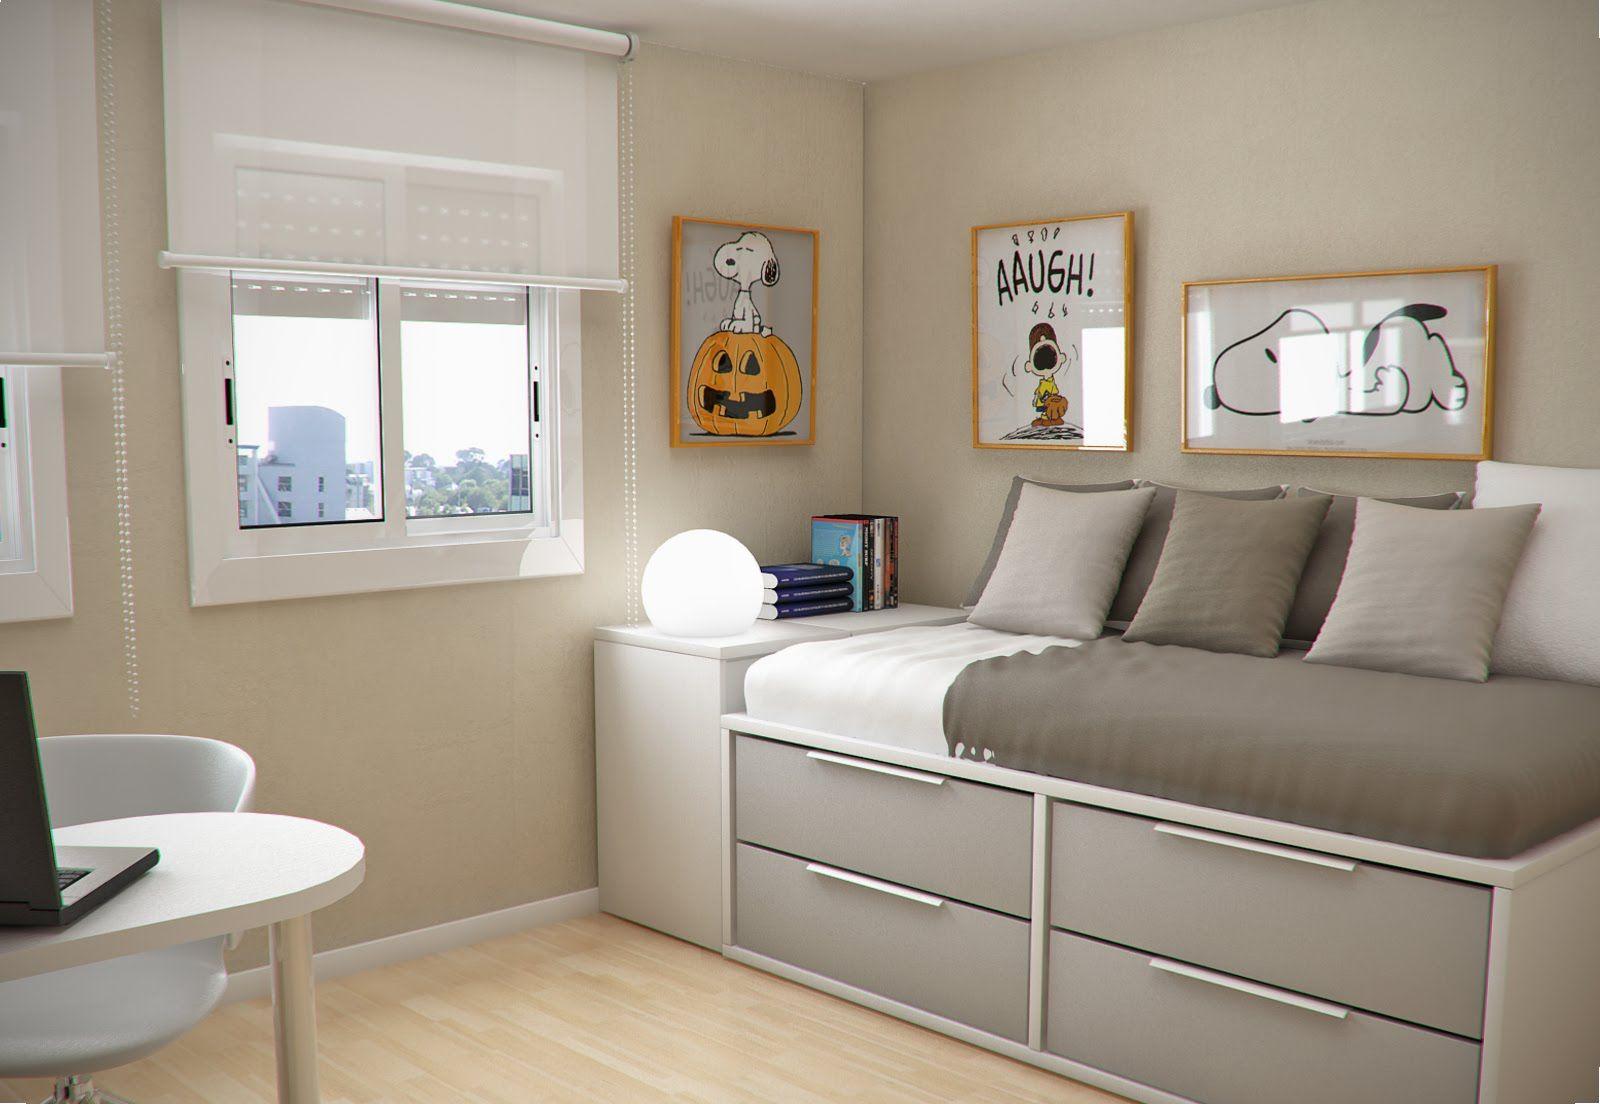 pok j nastolatki biurko szukaj w google jugendzimmer pinterest kinderzimmer kleines. Black Bedroom Furniture Sets. Home Design Ideas